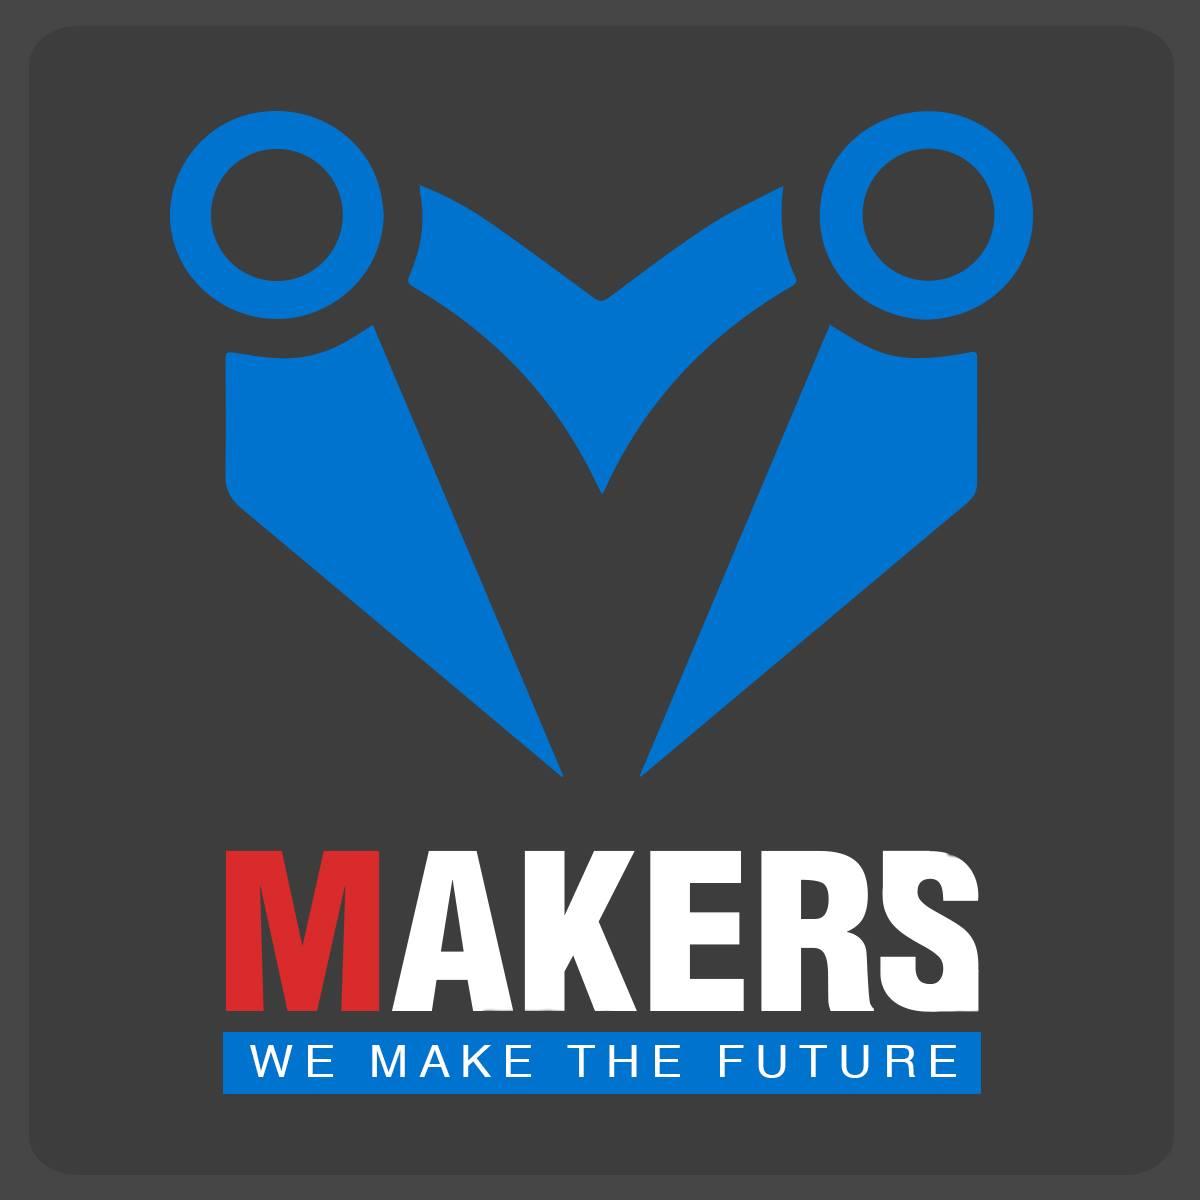 ميكرز إليكترونكس Makers Electronics